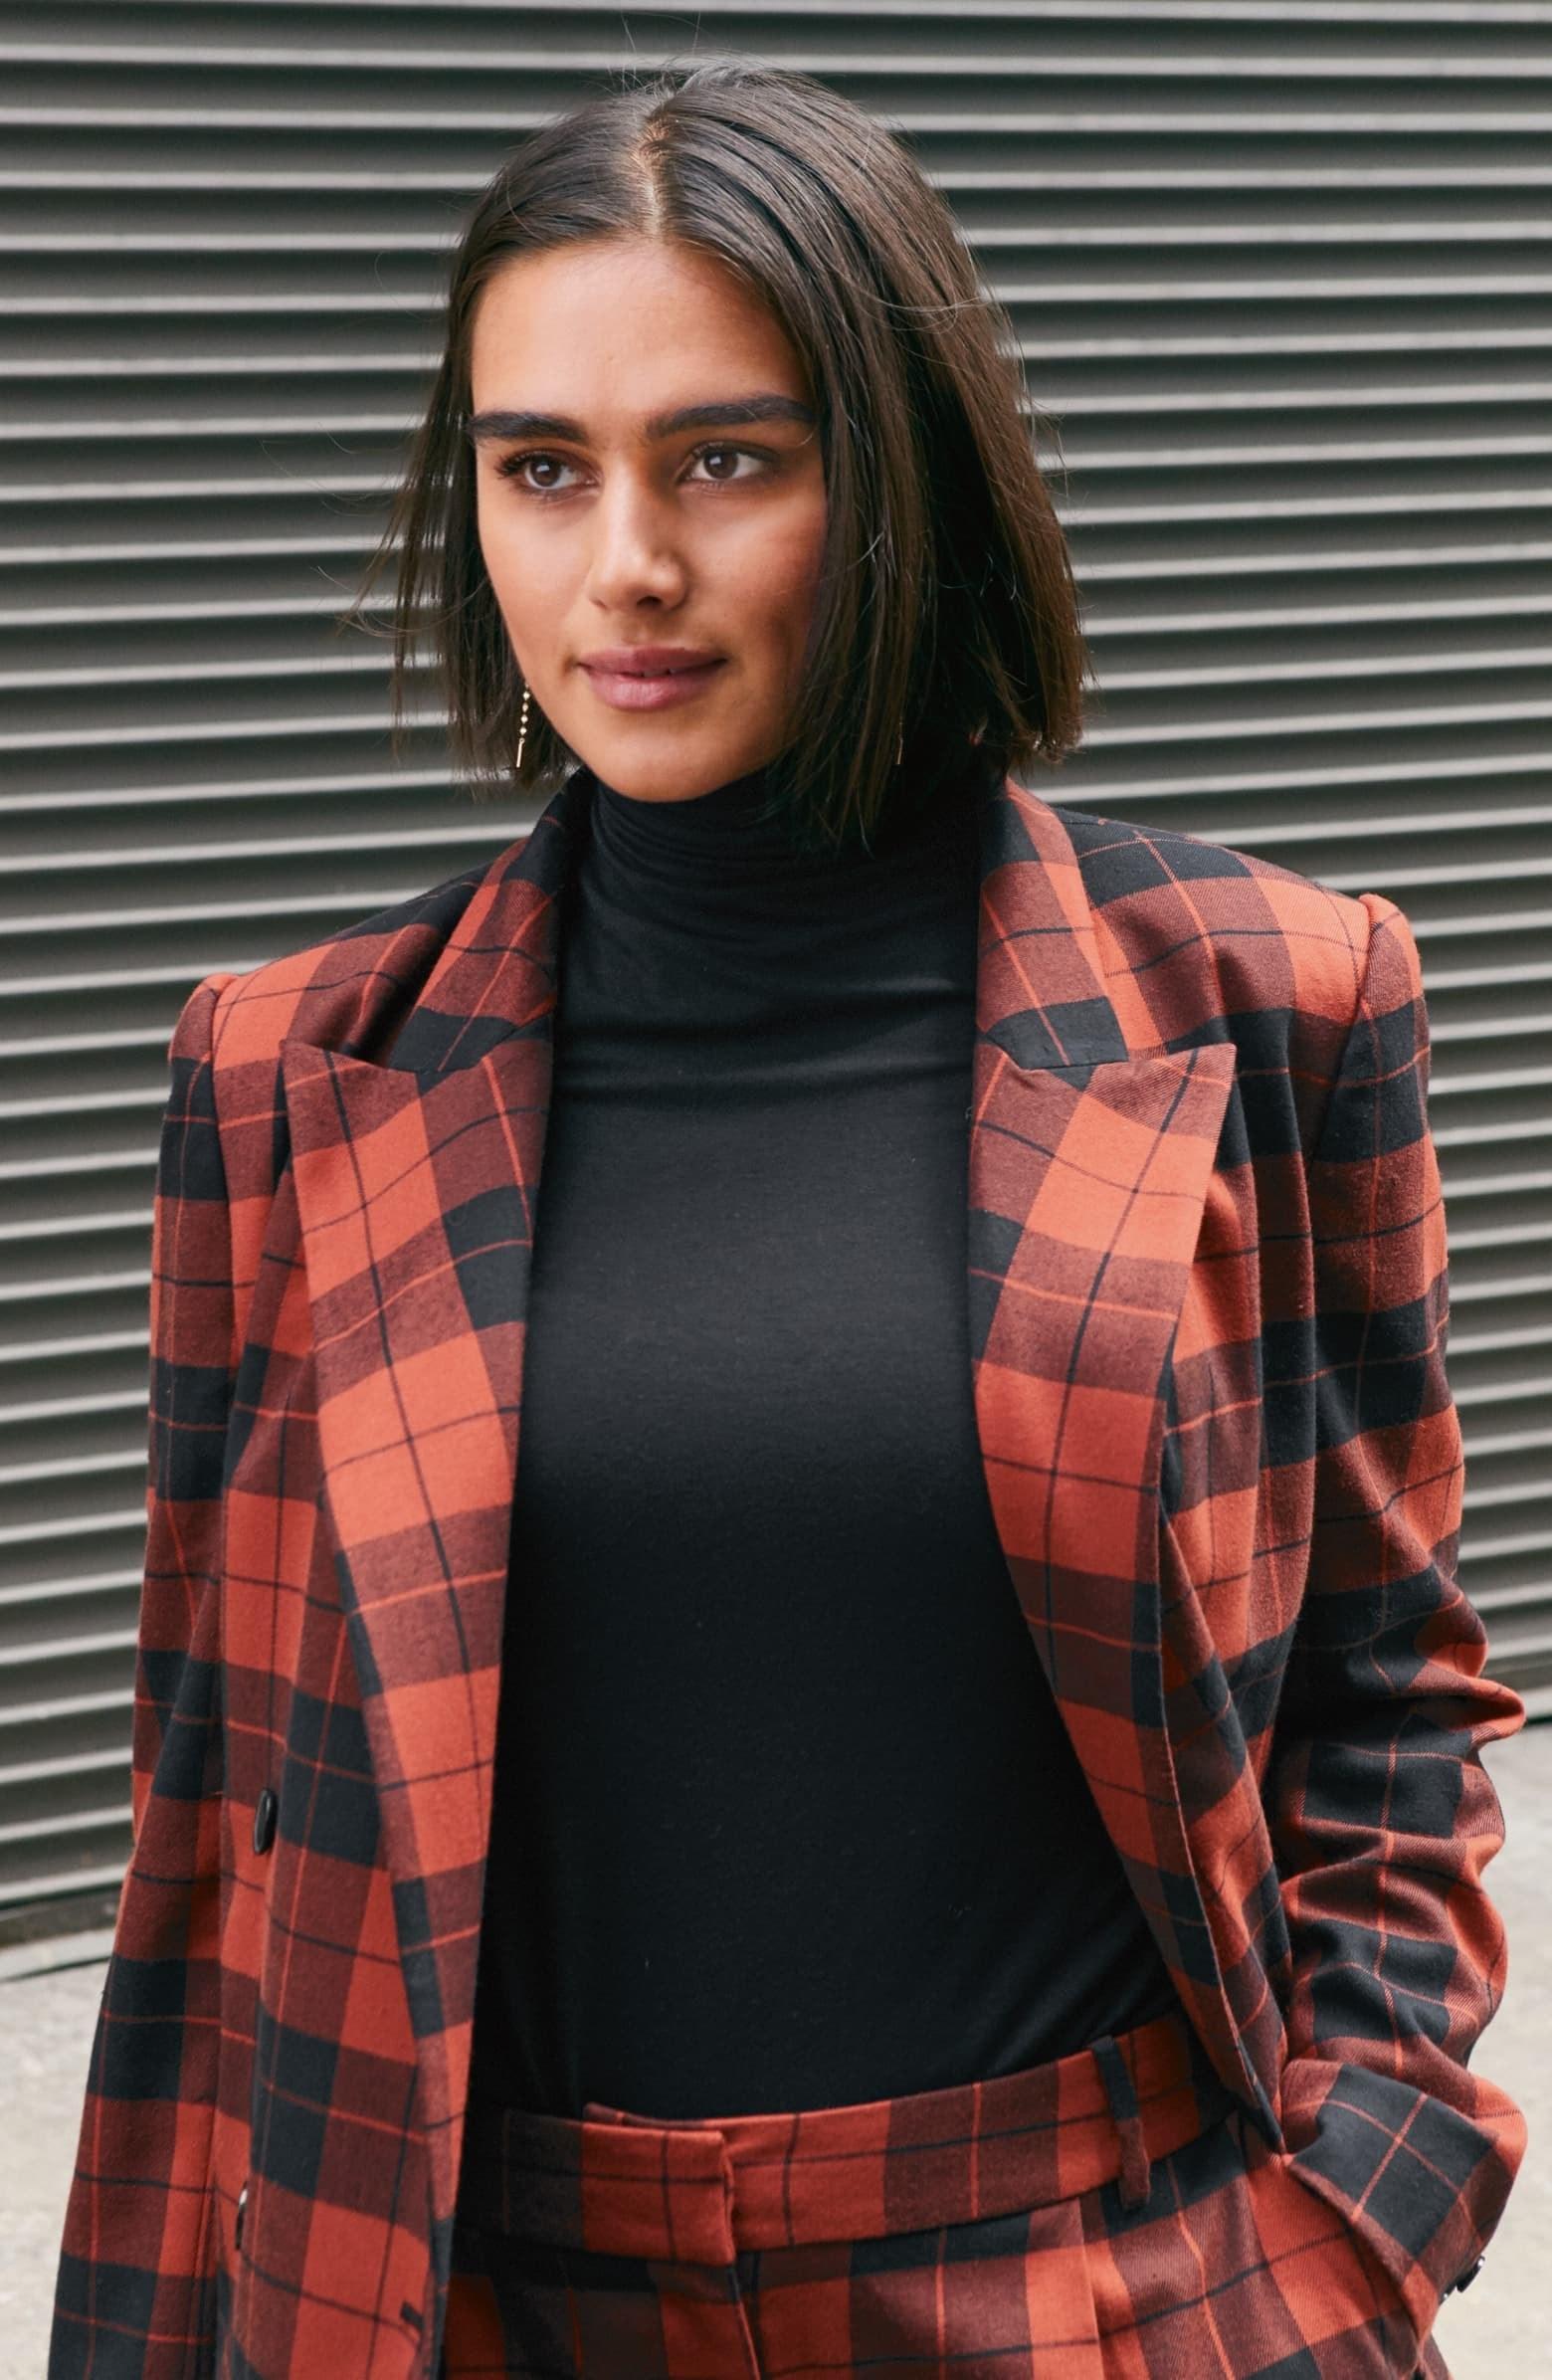 model wearing the thin turtleneck in black